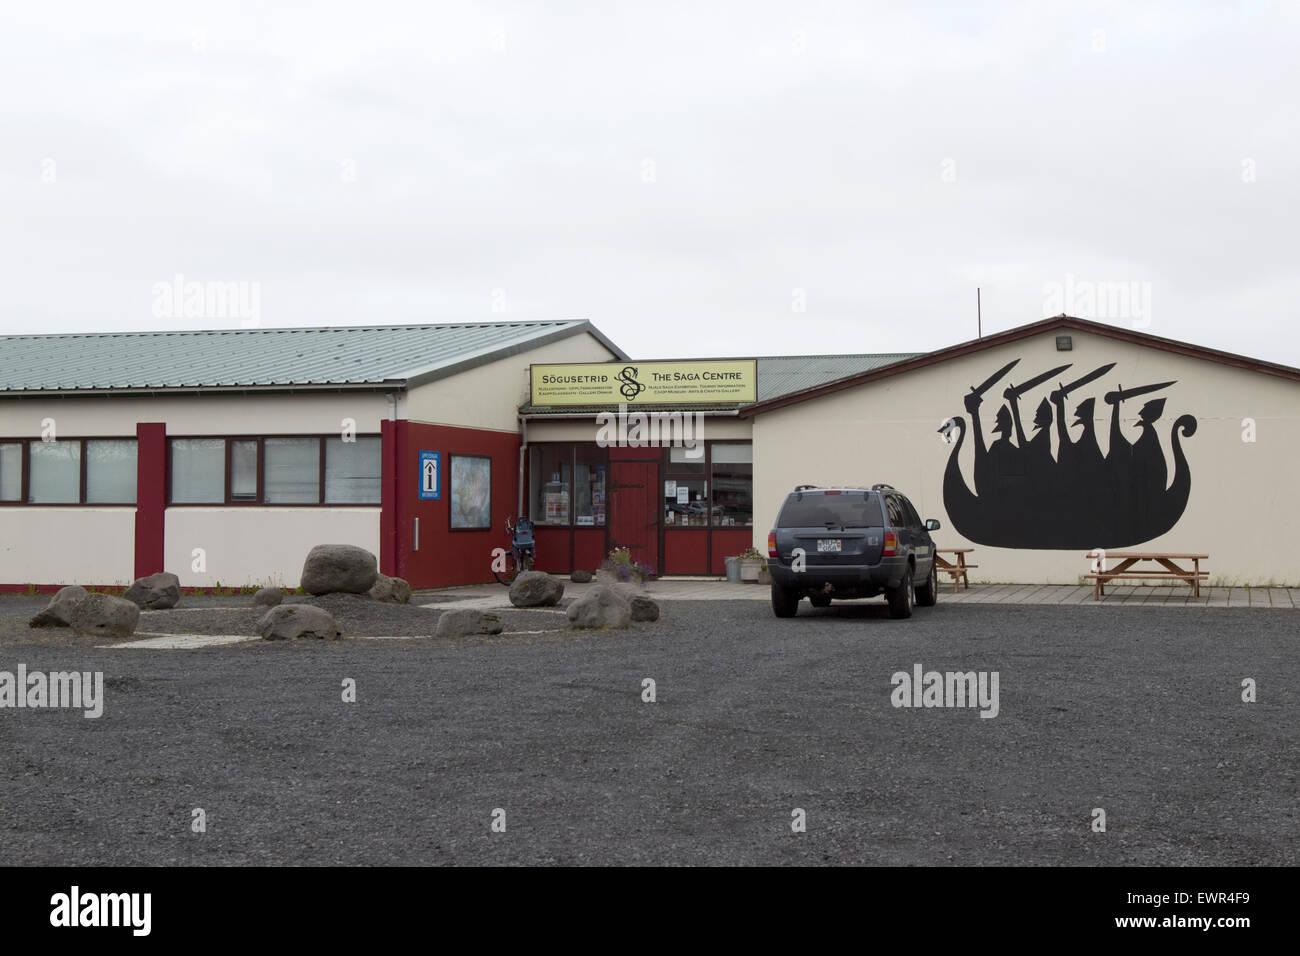 sogusetrid the saga centre Hlidarendi Hvolsvollur Iceland - Stock Image